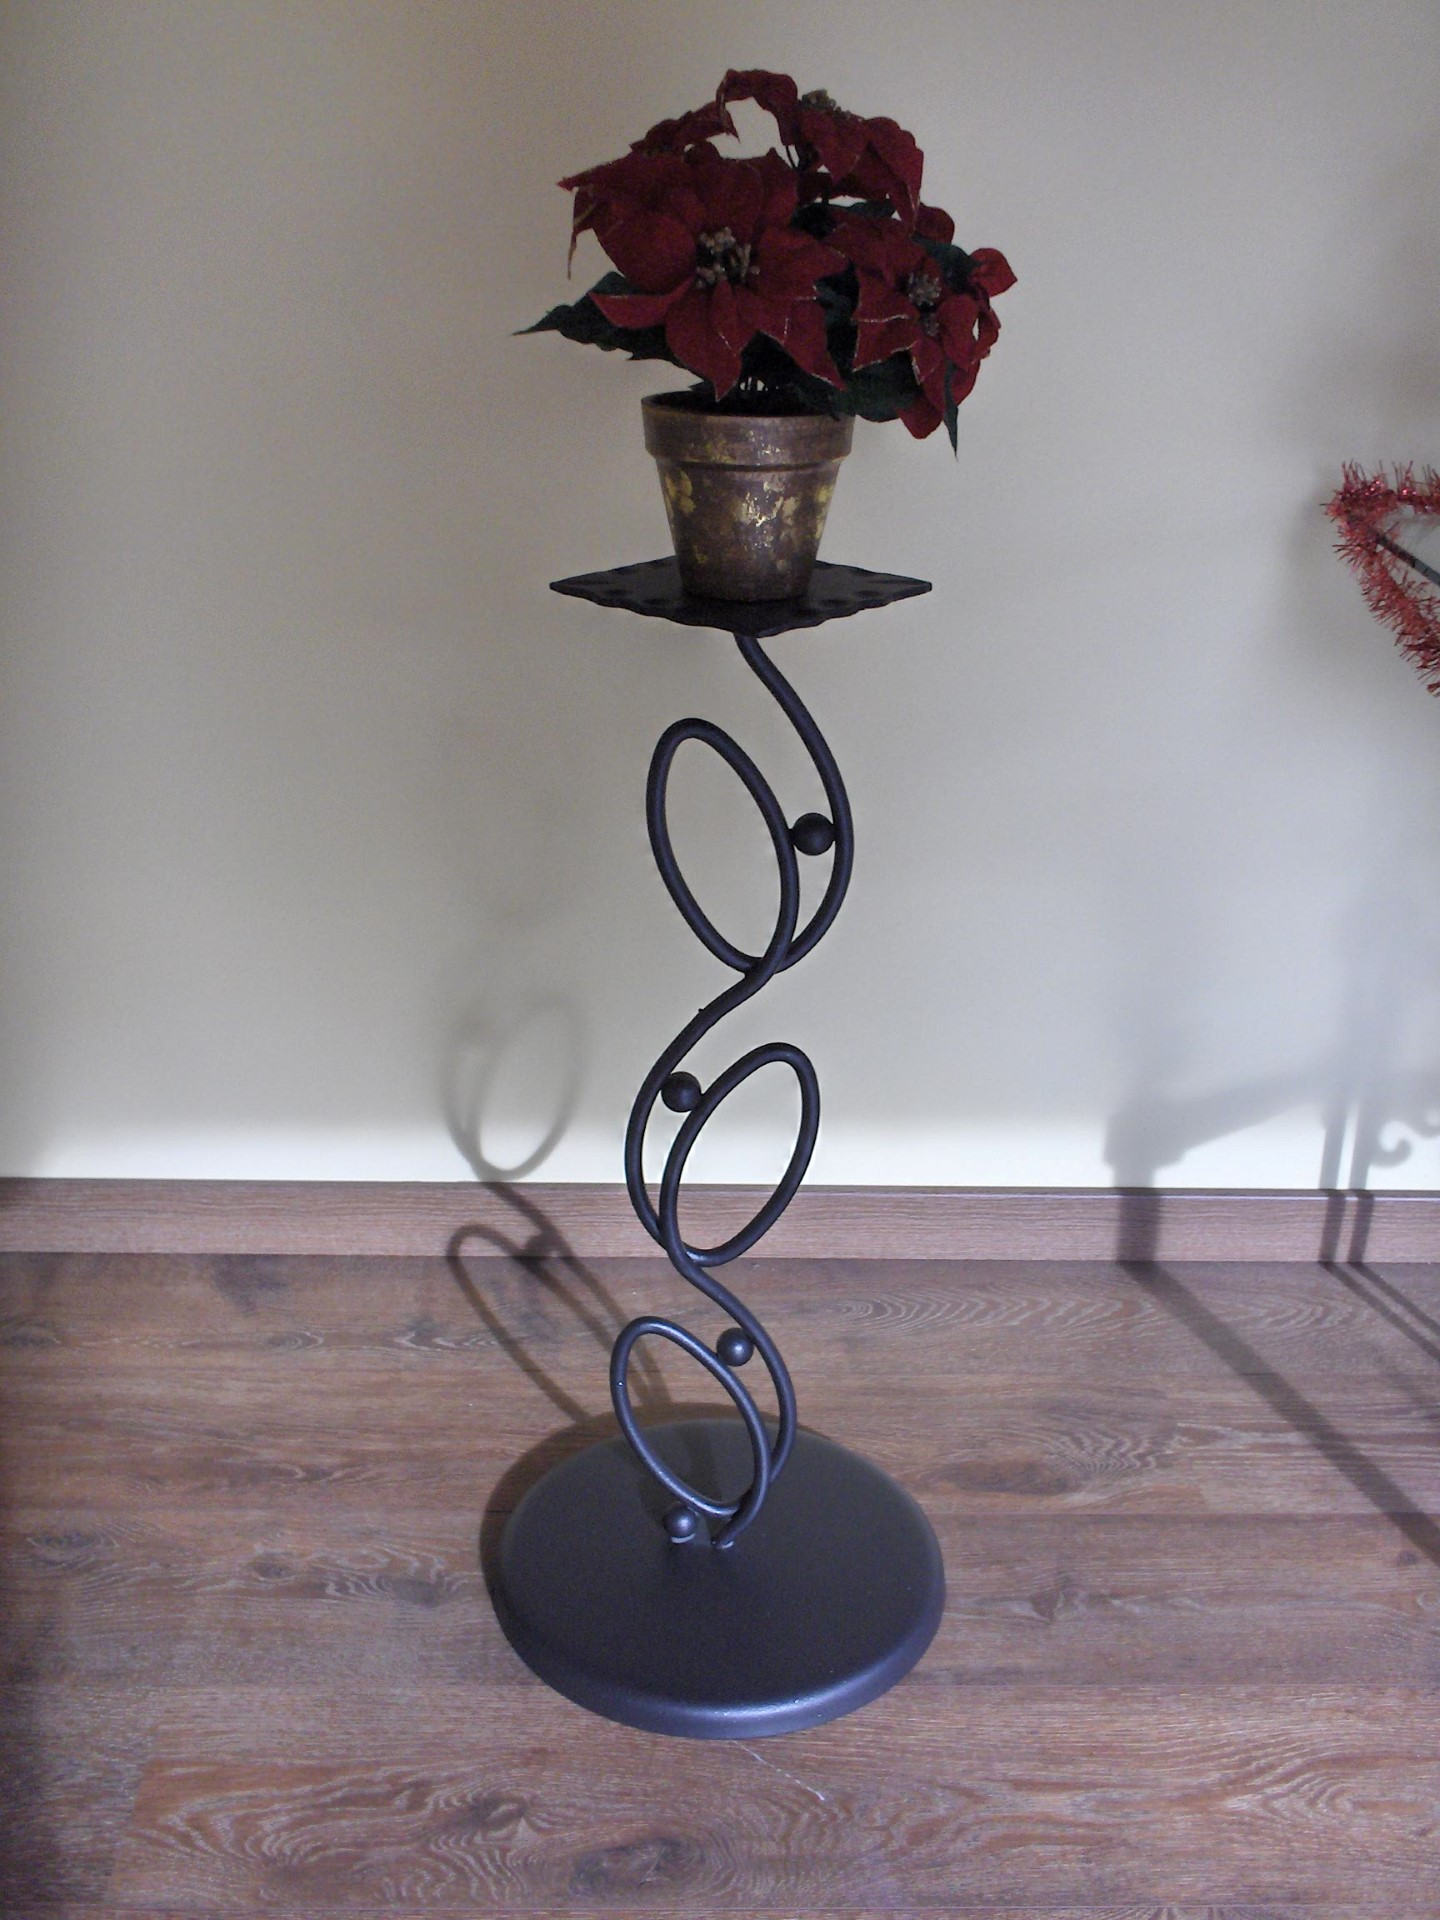 Portavasi edera la casa del ferro battuto - Porta vasi in ferro battuto ...